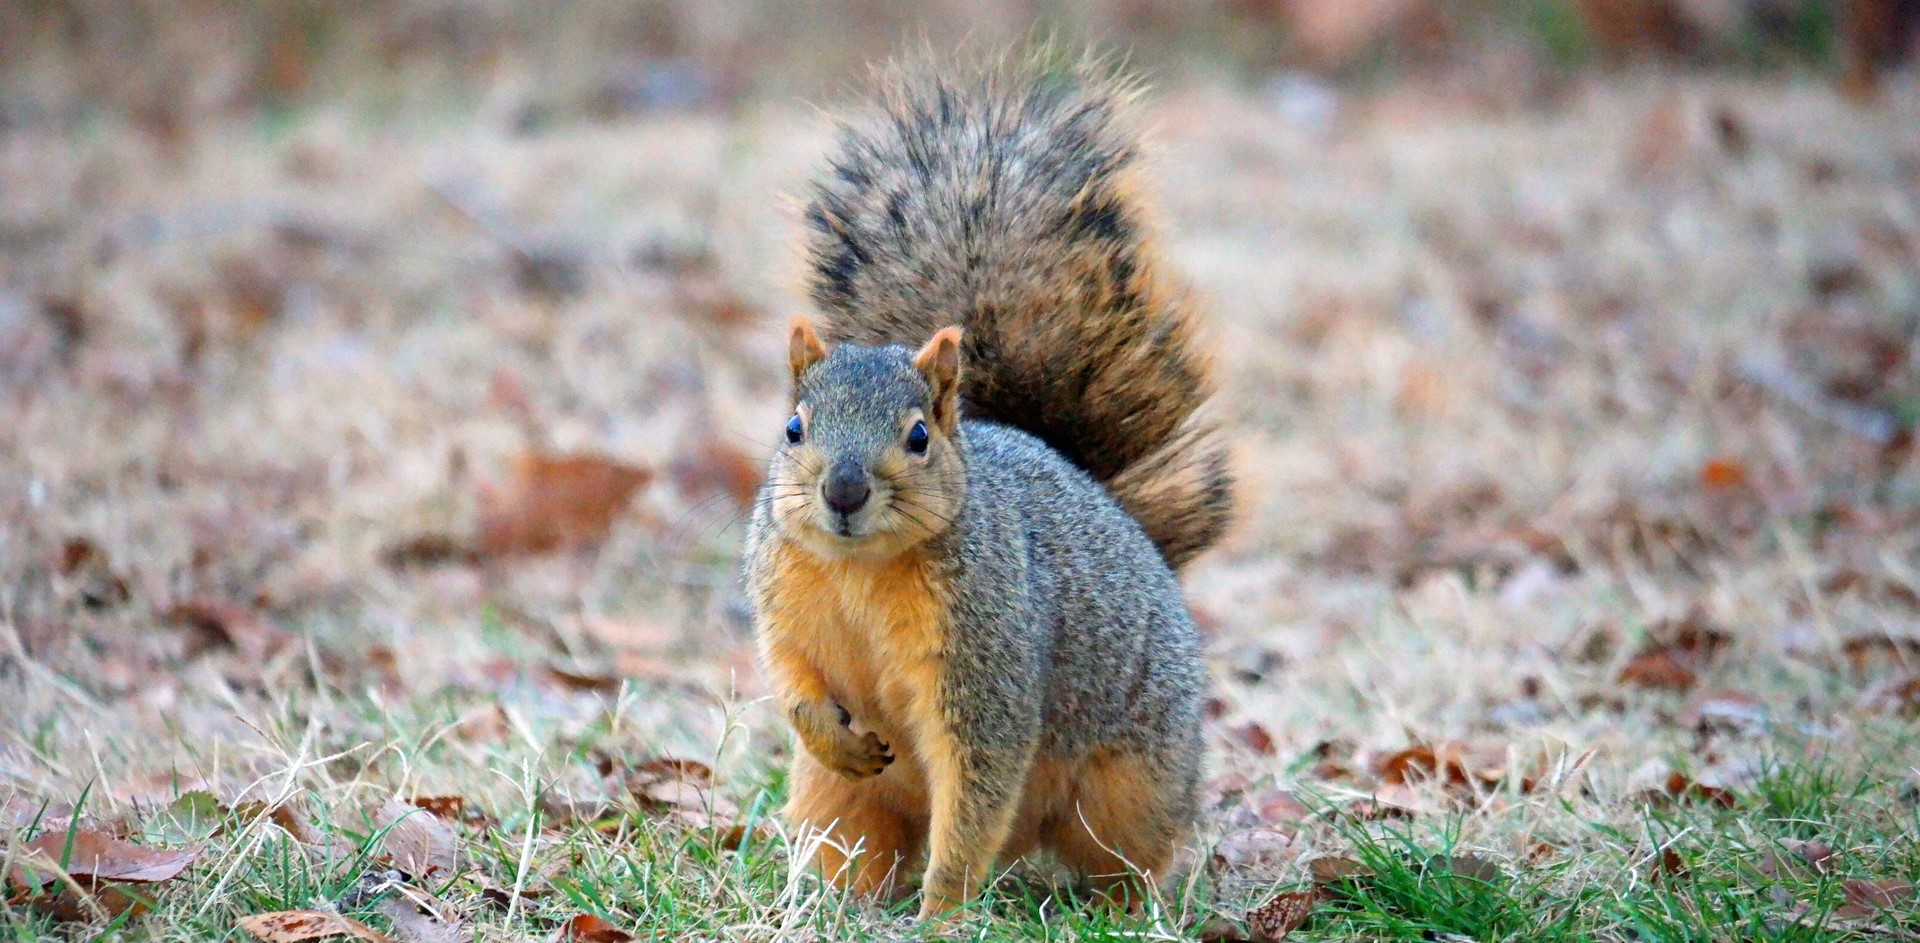 Image of fox squirrel